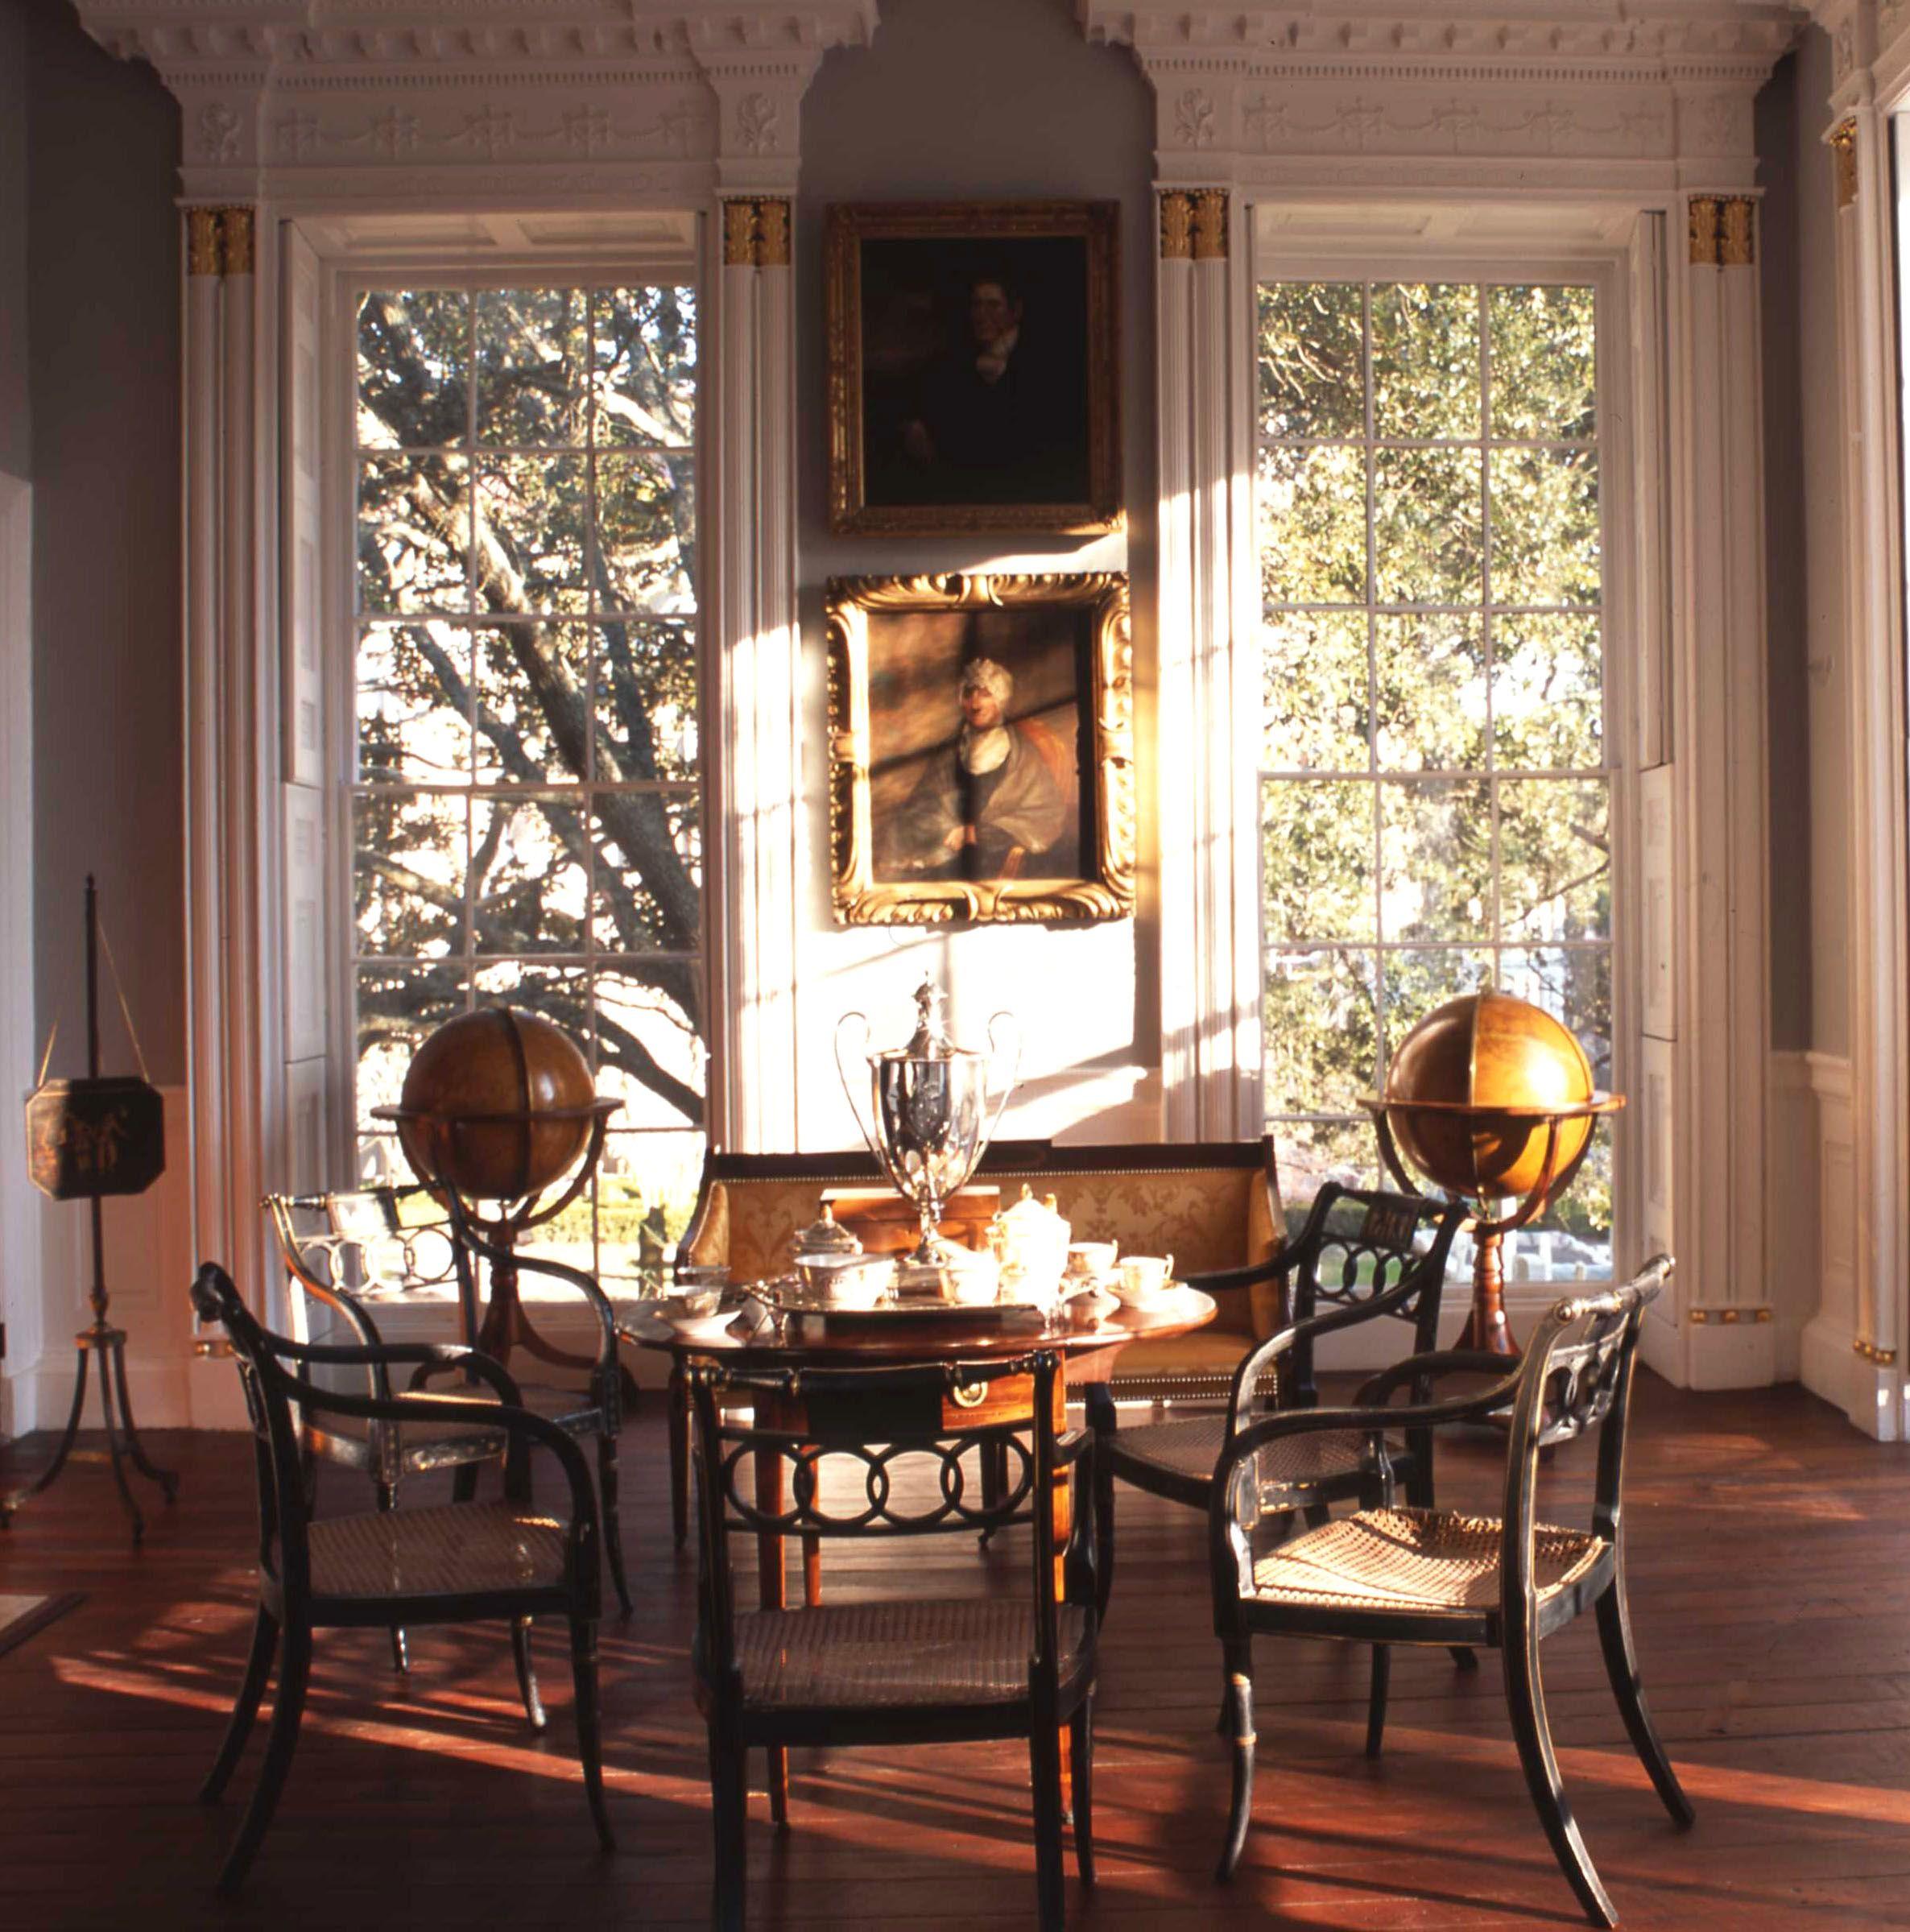 Ashley Furniture North Charleston Sc: Morning Room, Nathaniel Russell House, Charleston, South